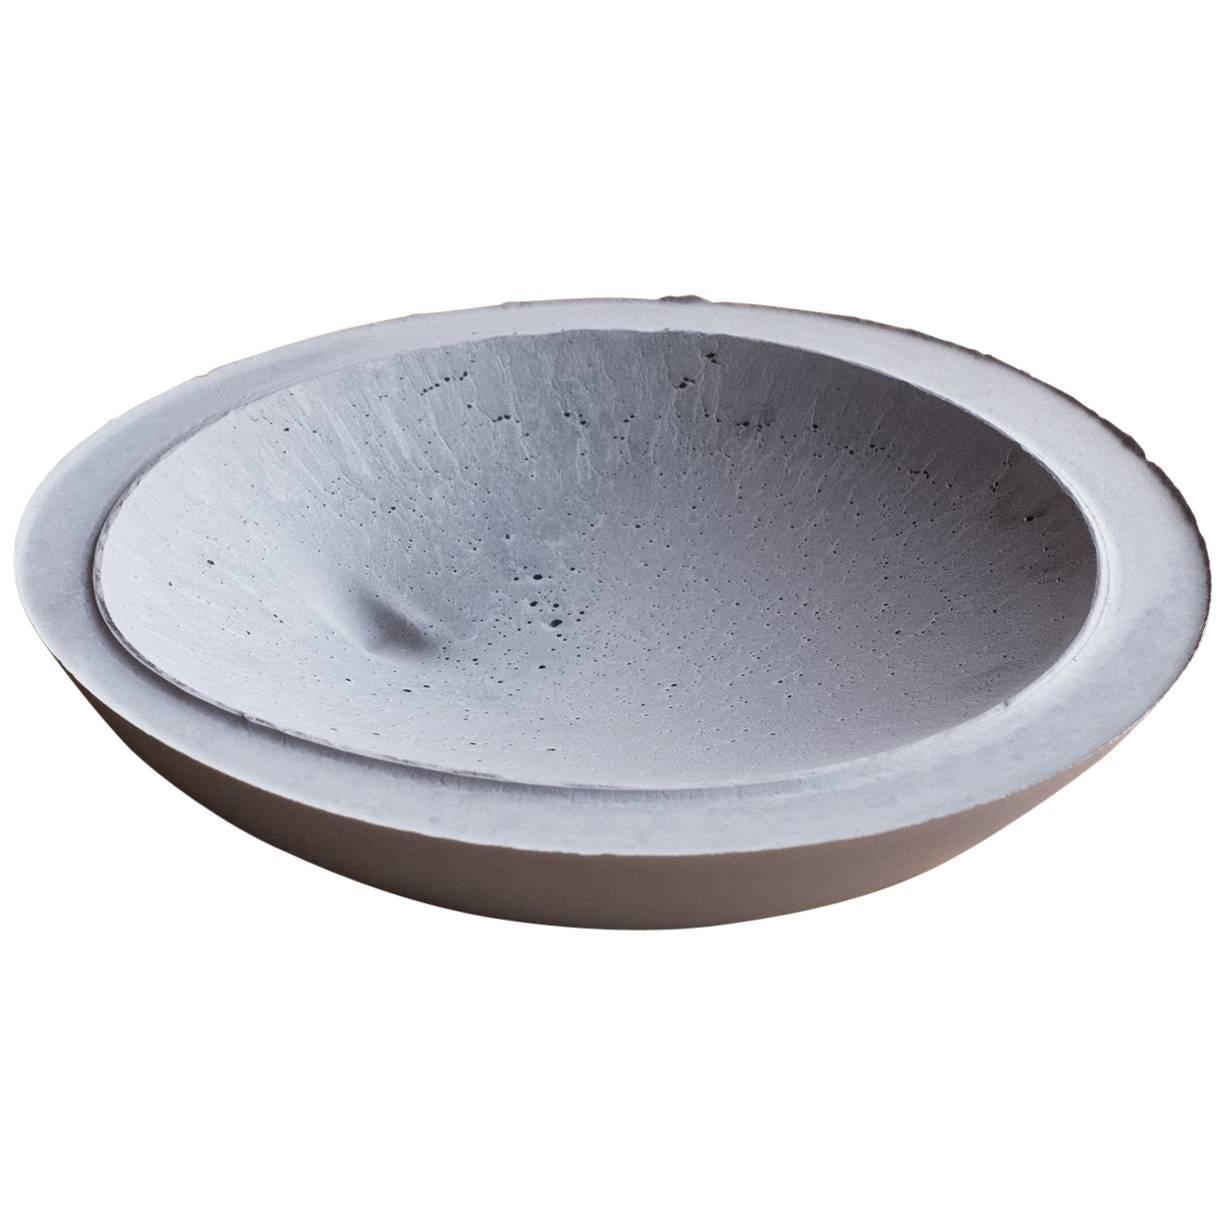 Handmade Cast Concrete Bowl in Grey by UMÉ Studio